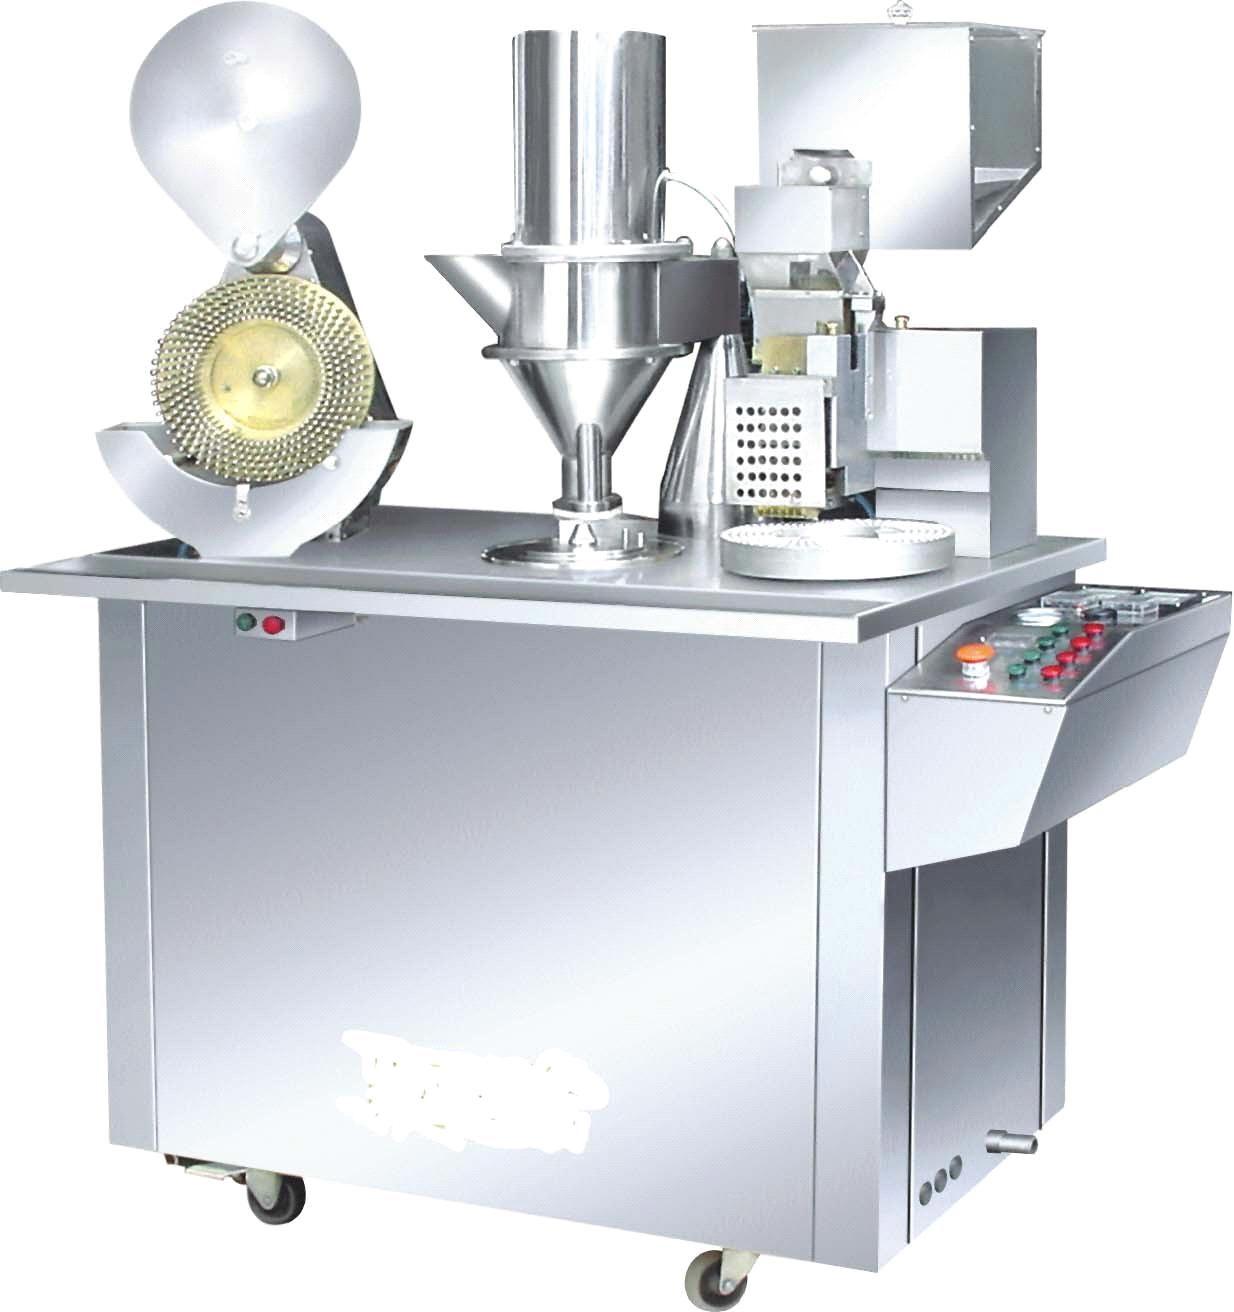 Dtj C Semi Automatic Capsule Filling Machine Capsule Machine Dtj C China Capsule Filling Machines General Capsule Machine Machine Manufacturing